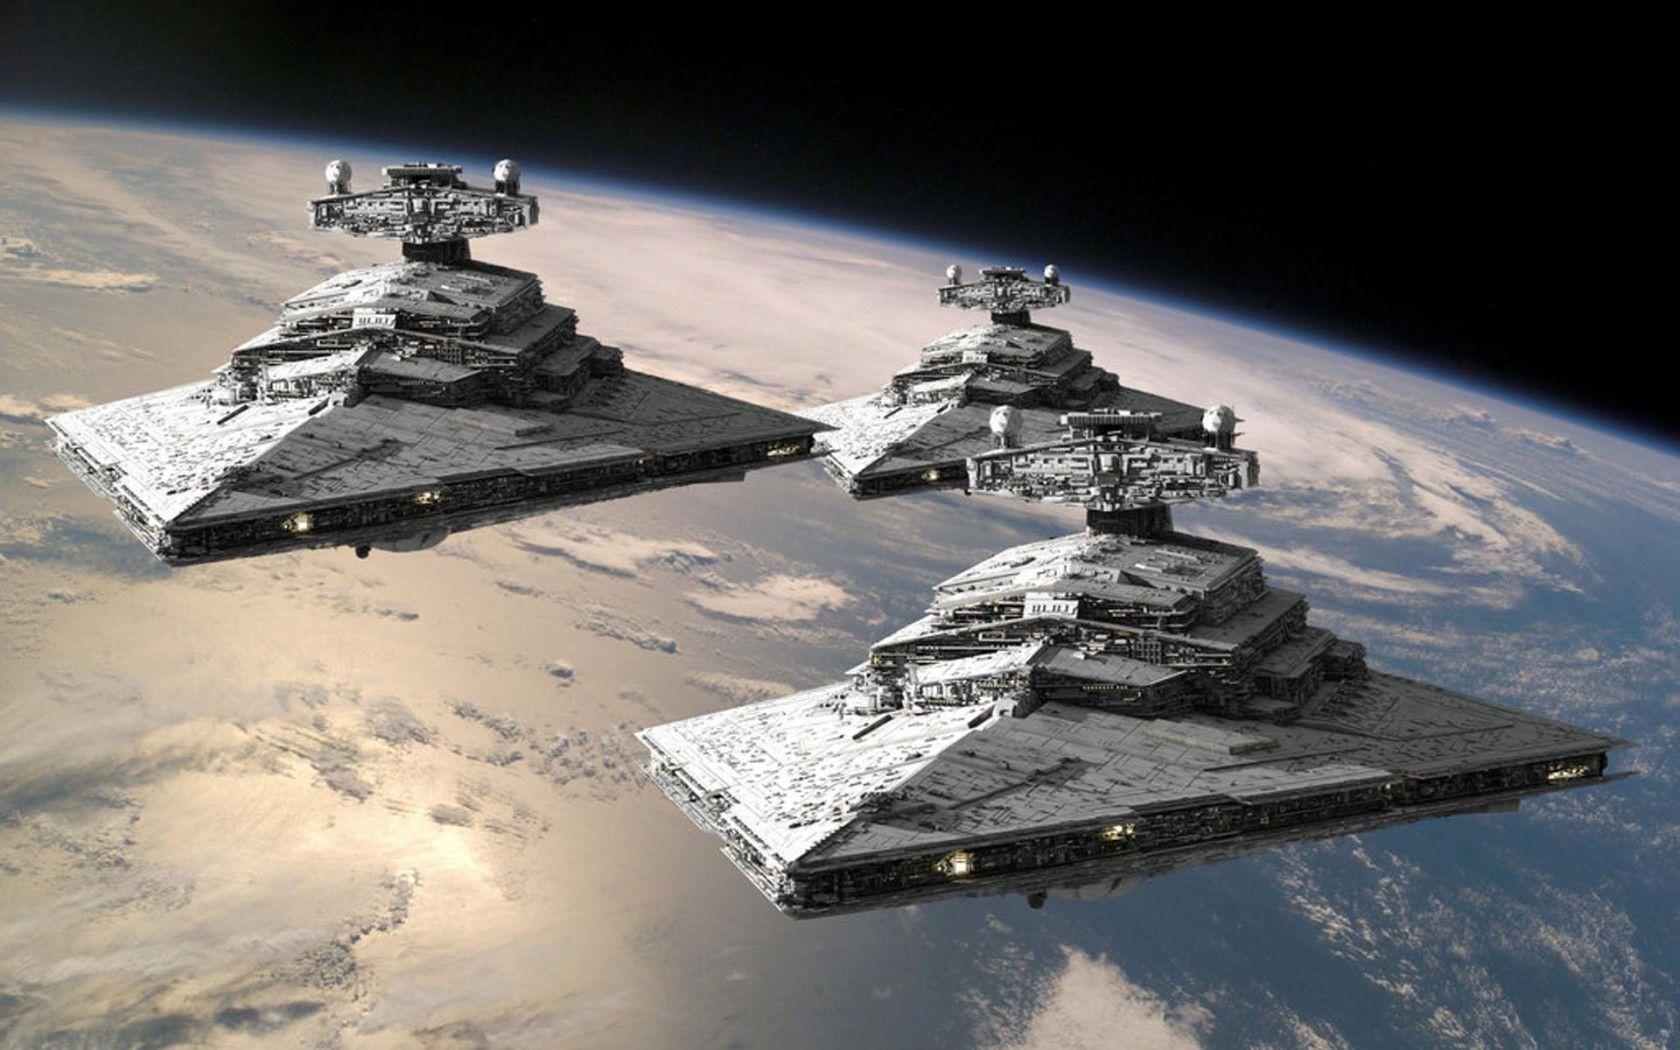 Spaceship Wallpaper - Viewing Gallery